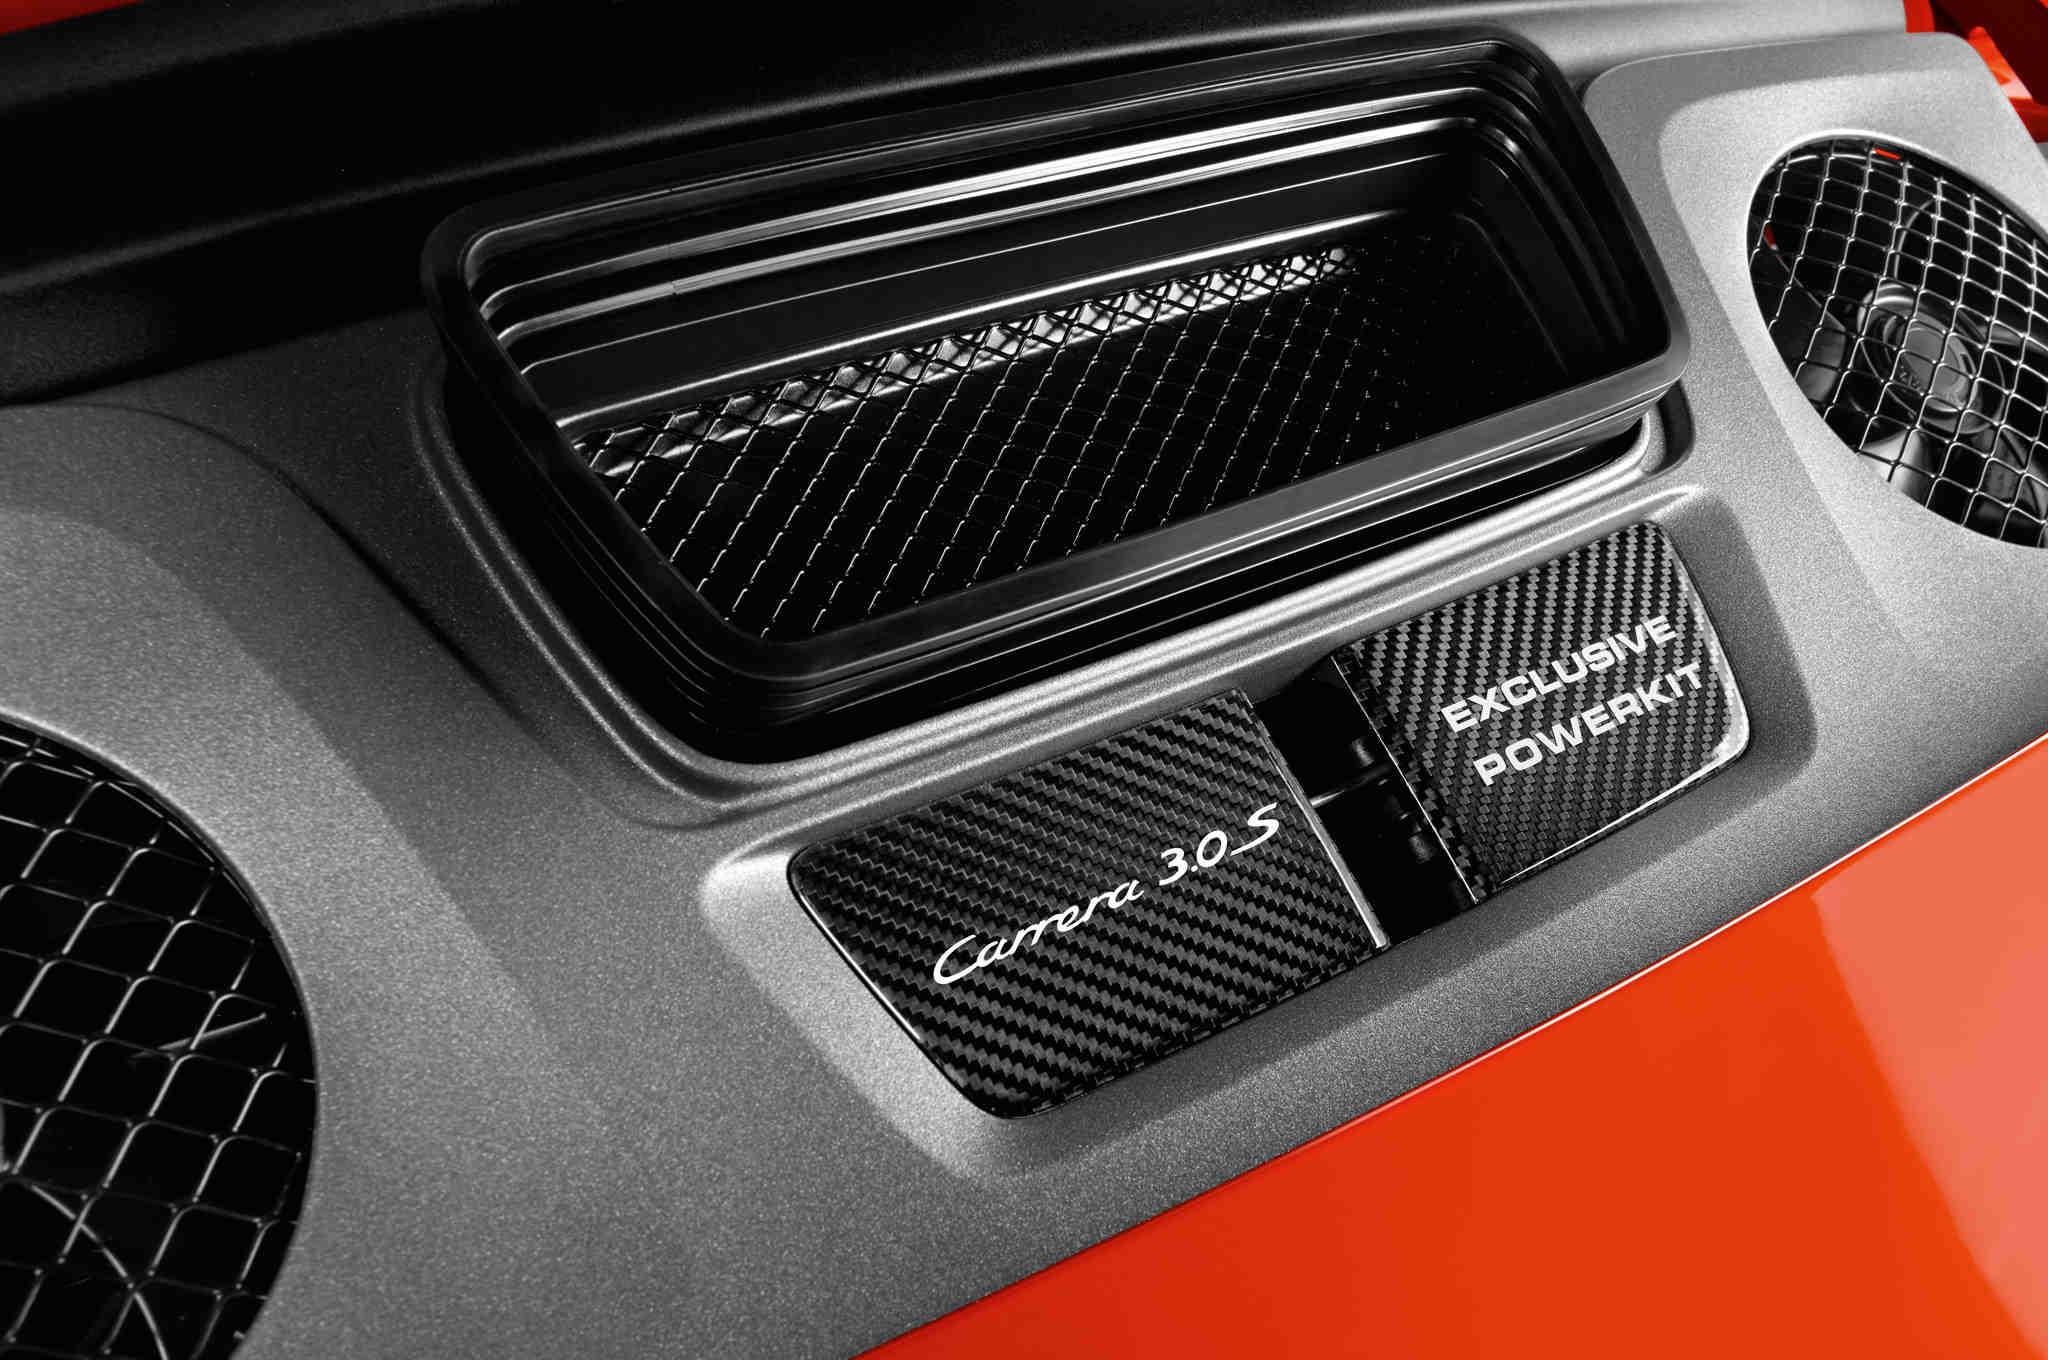 Carrera S power kit - Porsche 911 Parts Direct